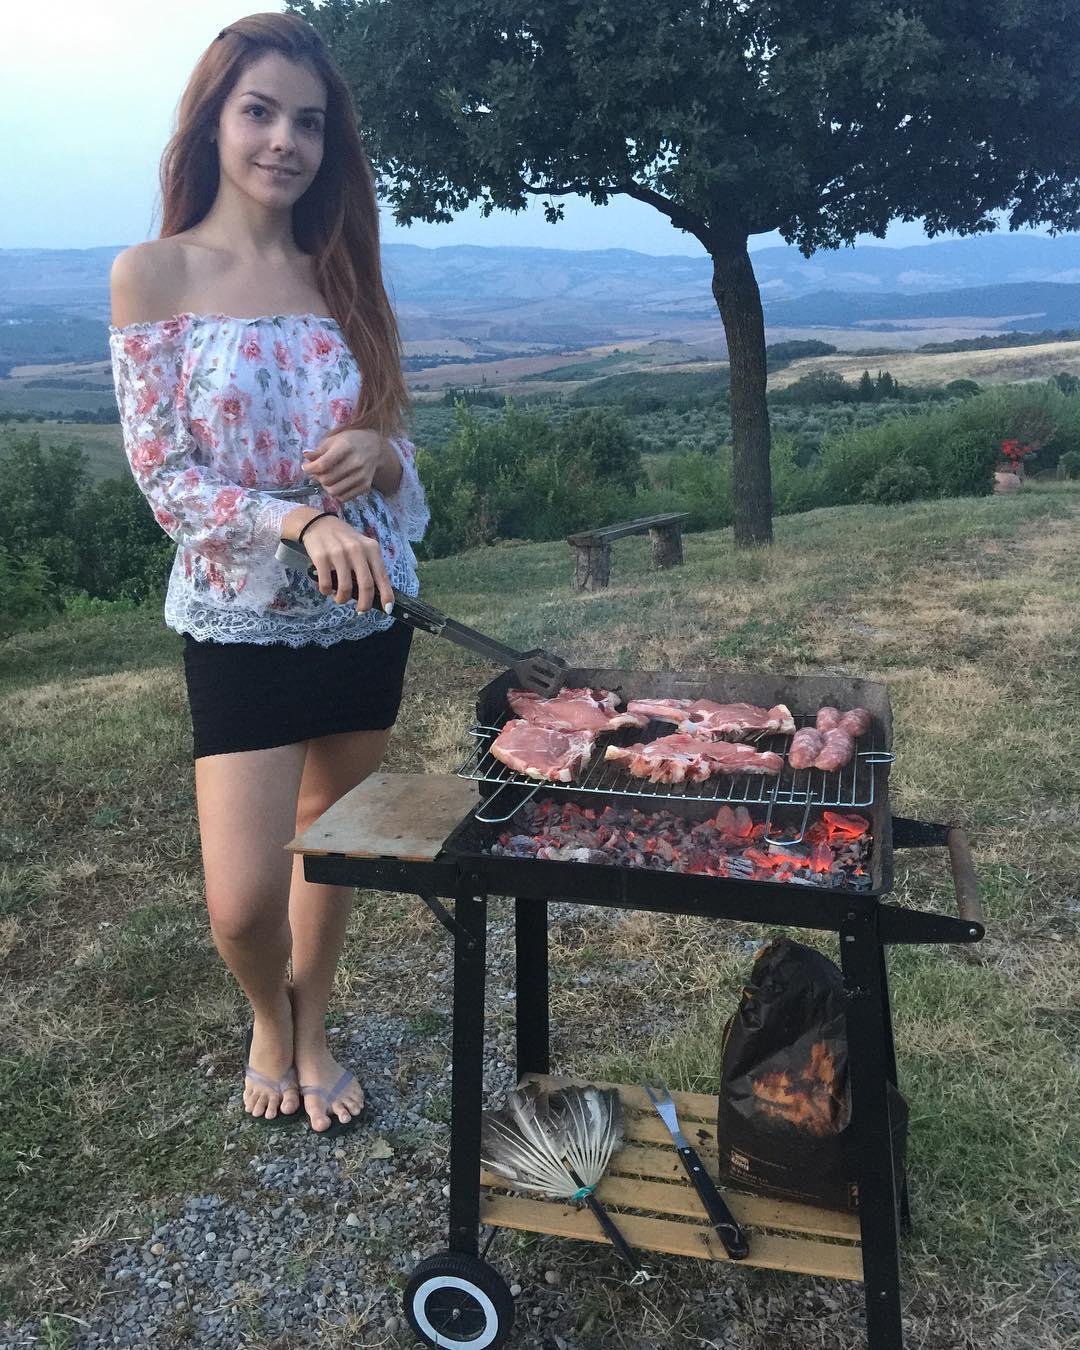 nathalie de oliveira, miss bom jardim 2019/1st runner-up de miss international queen 2016. - Página 3 37897510